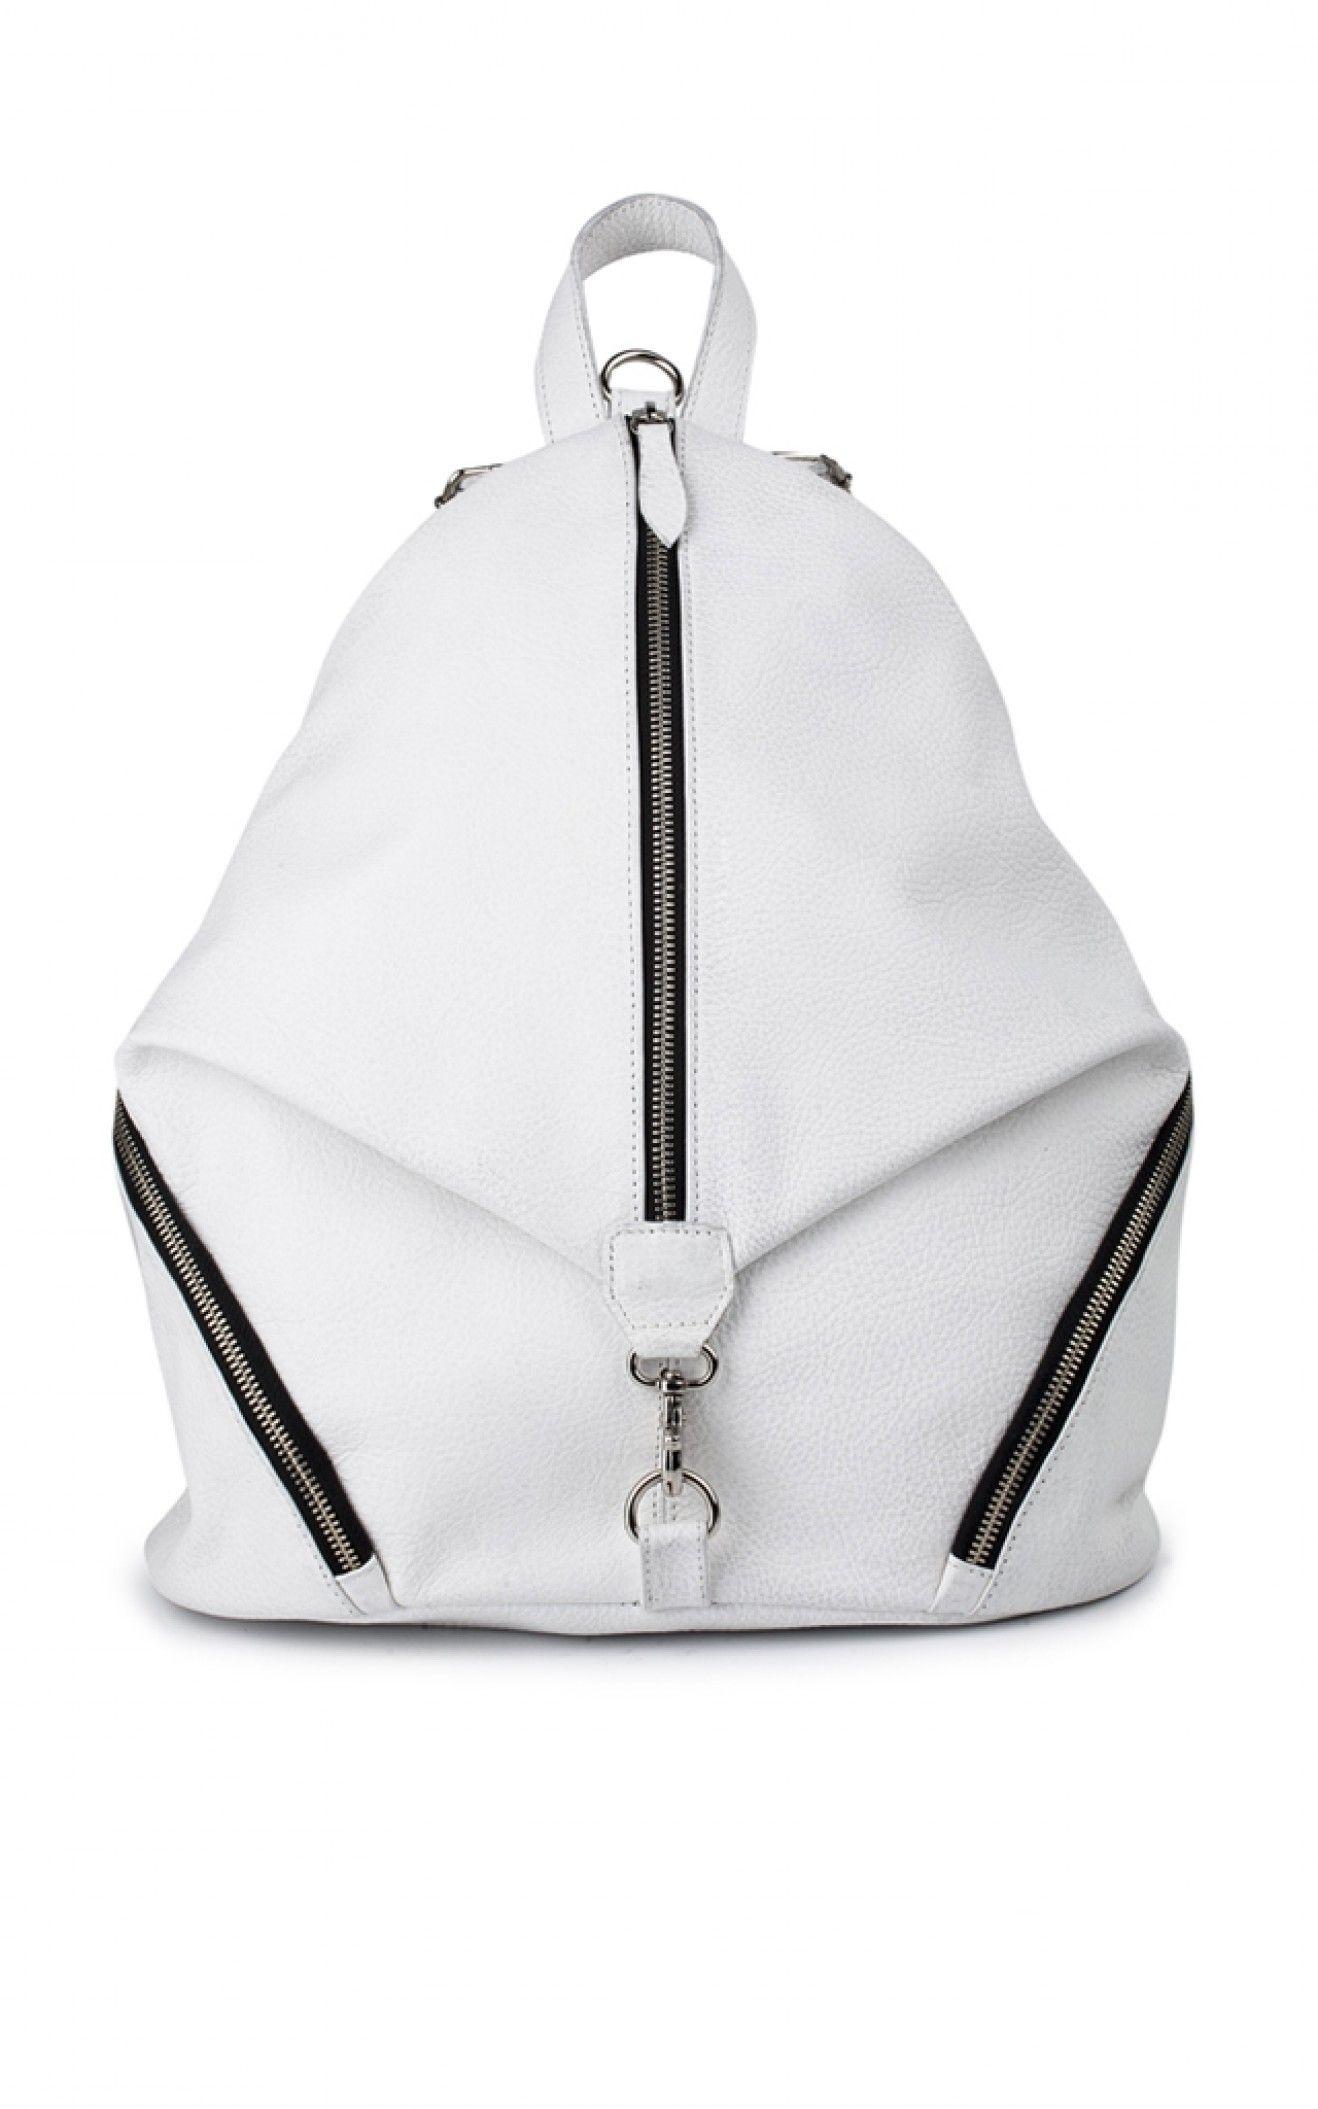 MOCHILA HARRISON | mochilas | Pinterest | Mochilas, Bolso con flecos ...